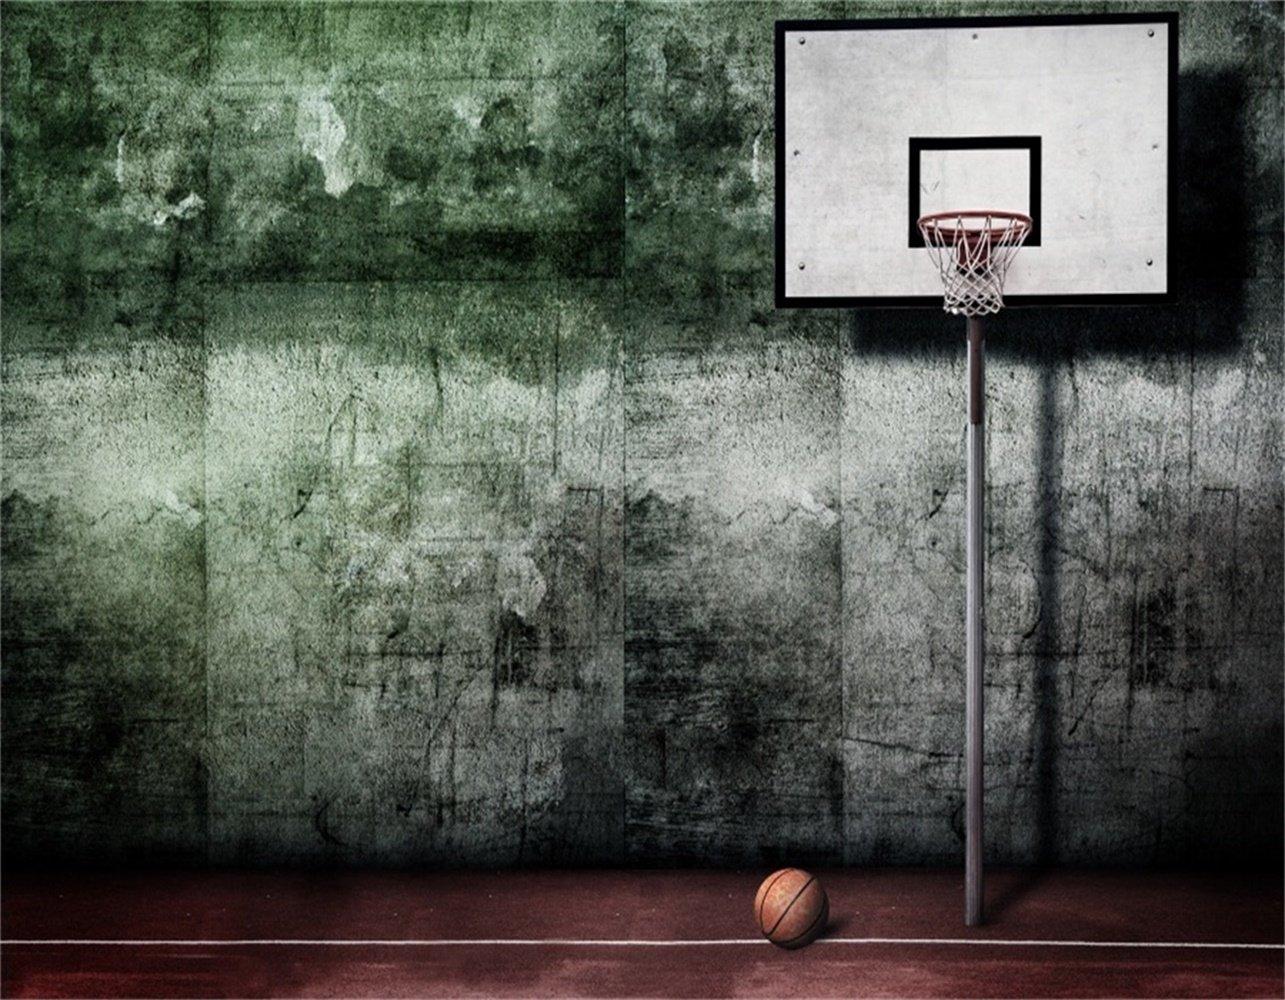 AOFOTO 9x7フィート バスケットボール ダンク コートバックドロップ レトロ アウトドア ボールゲーム フィールド 写真 背景 シャビーグランジオールドセメント 壁 学校 スポーツ 遊び チーム トレーニング スタジアム フォトスタジオ 小道具 壁紙   B07C1TRCST